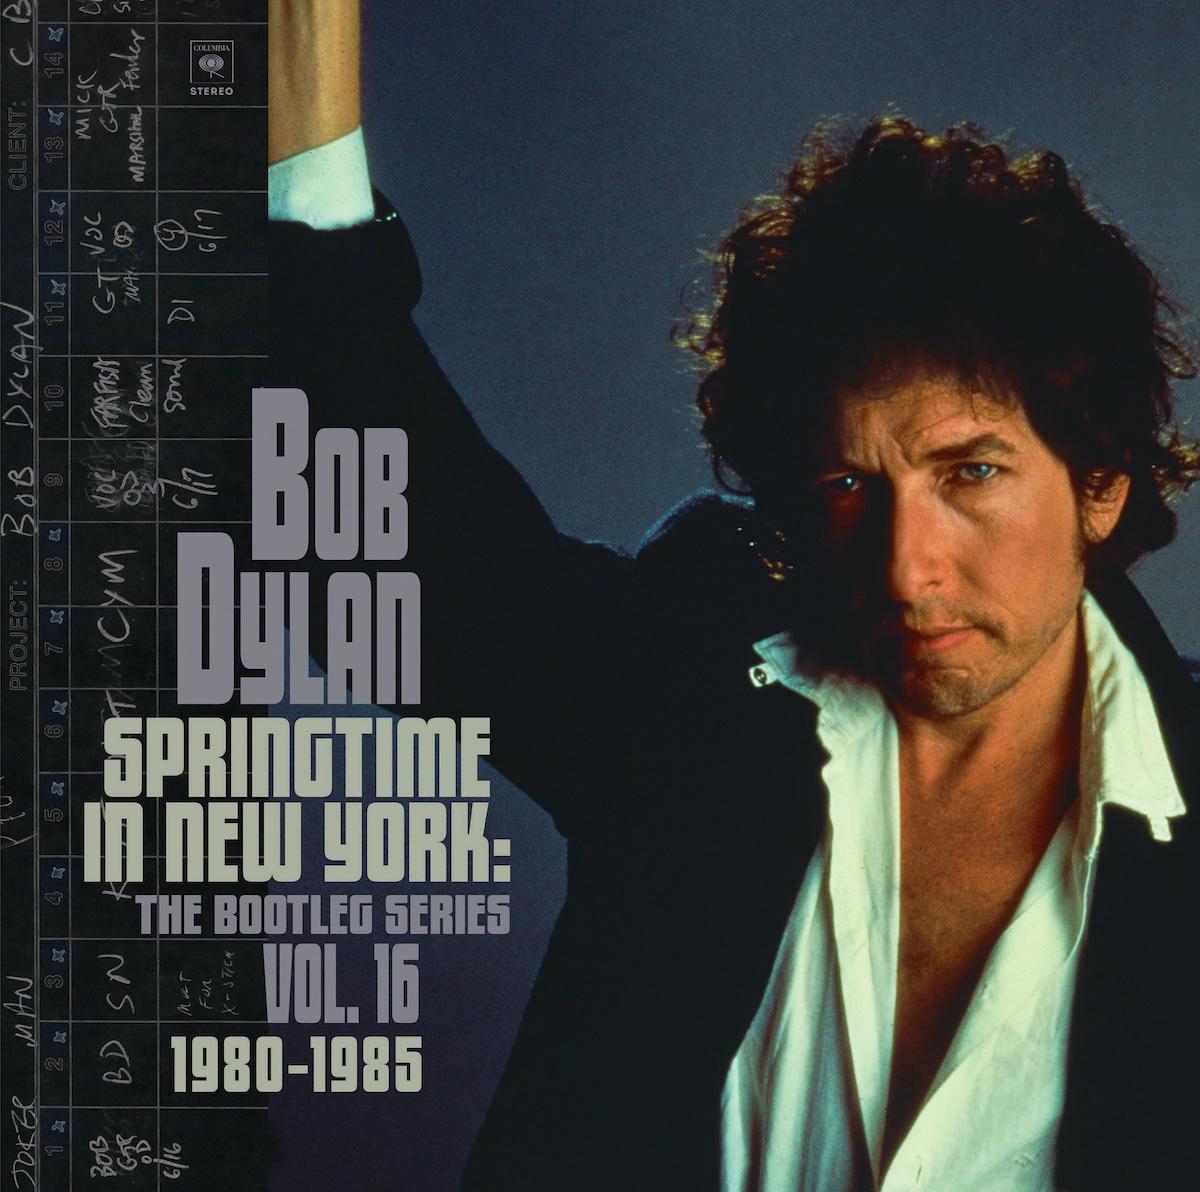 Springtime In New York: The Bootleg Series Vol. 16 1980-1985 - Bob Dylan